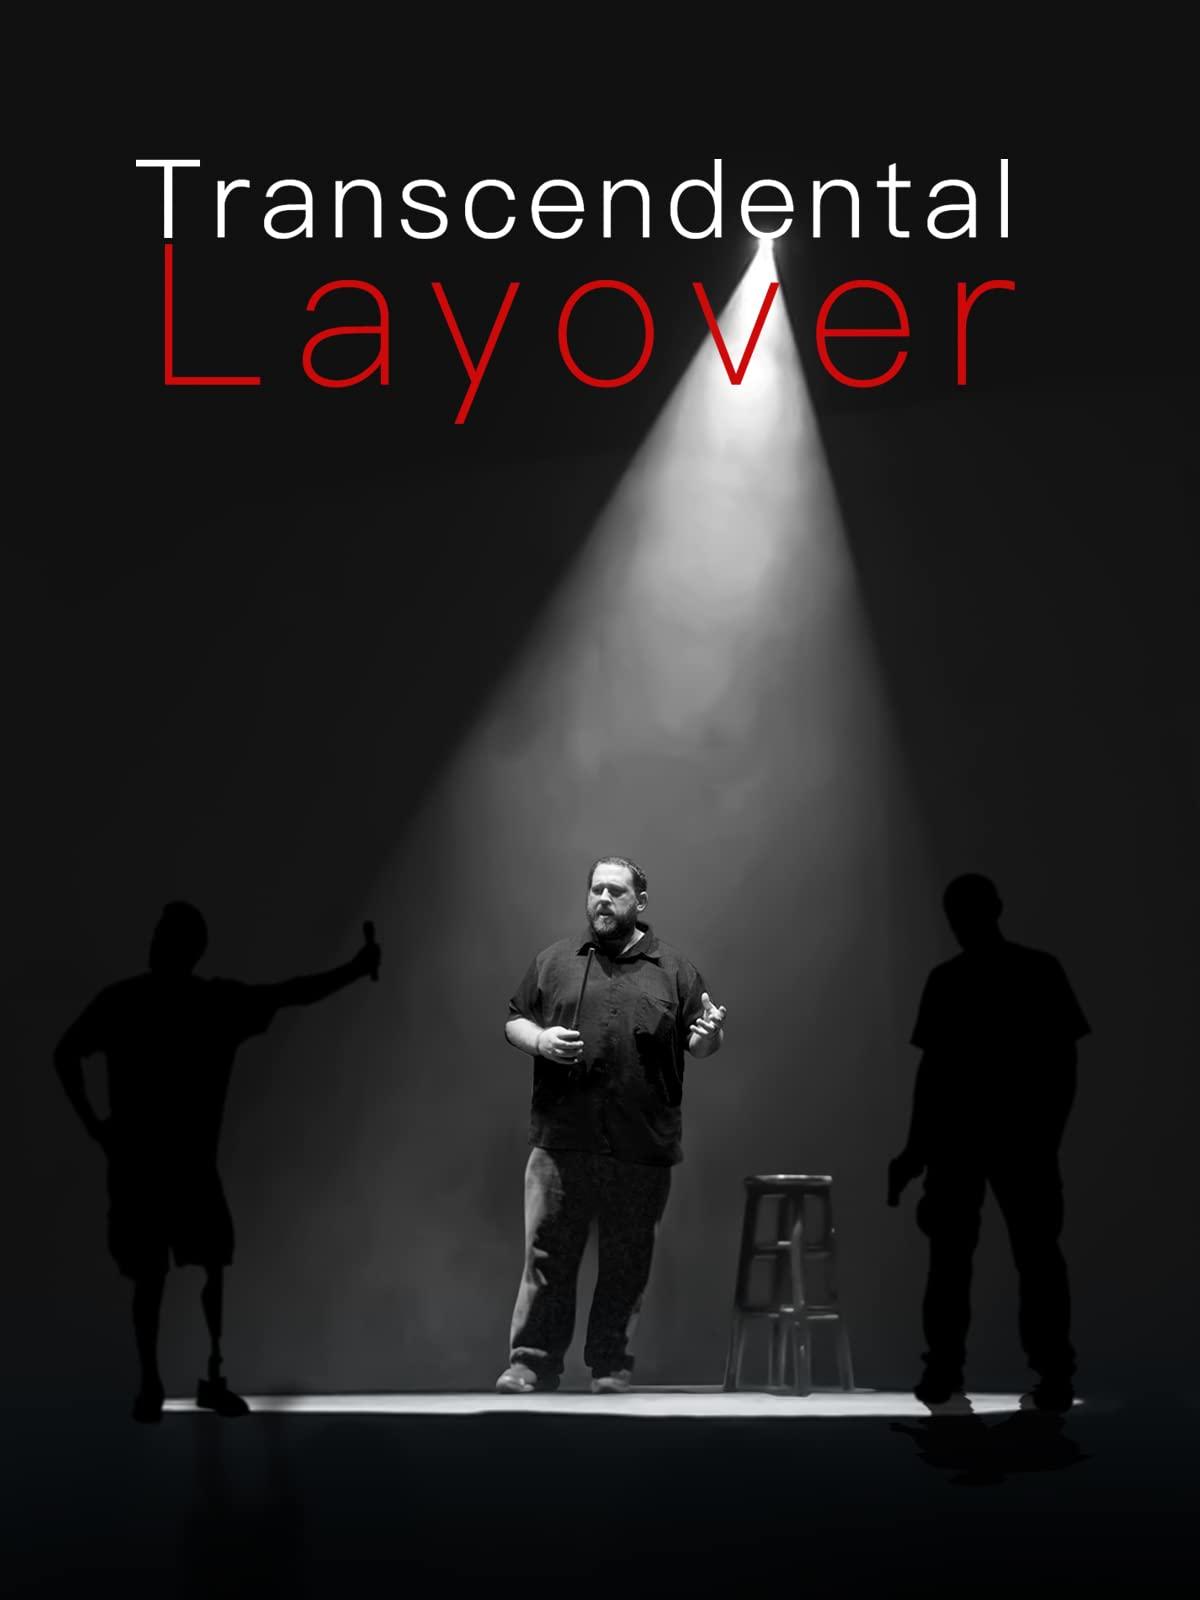 Transcendental Layover